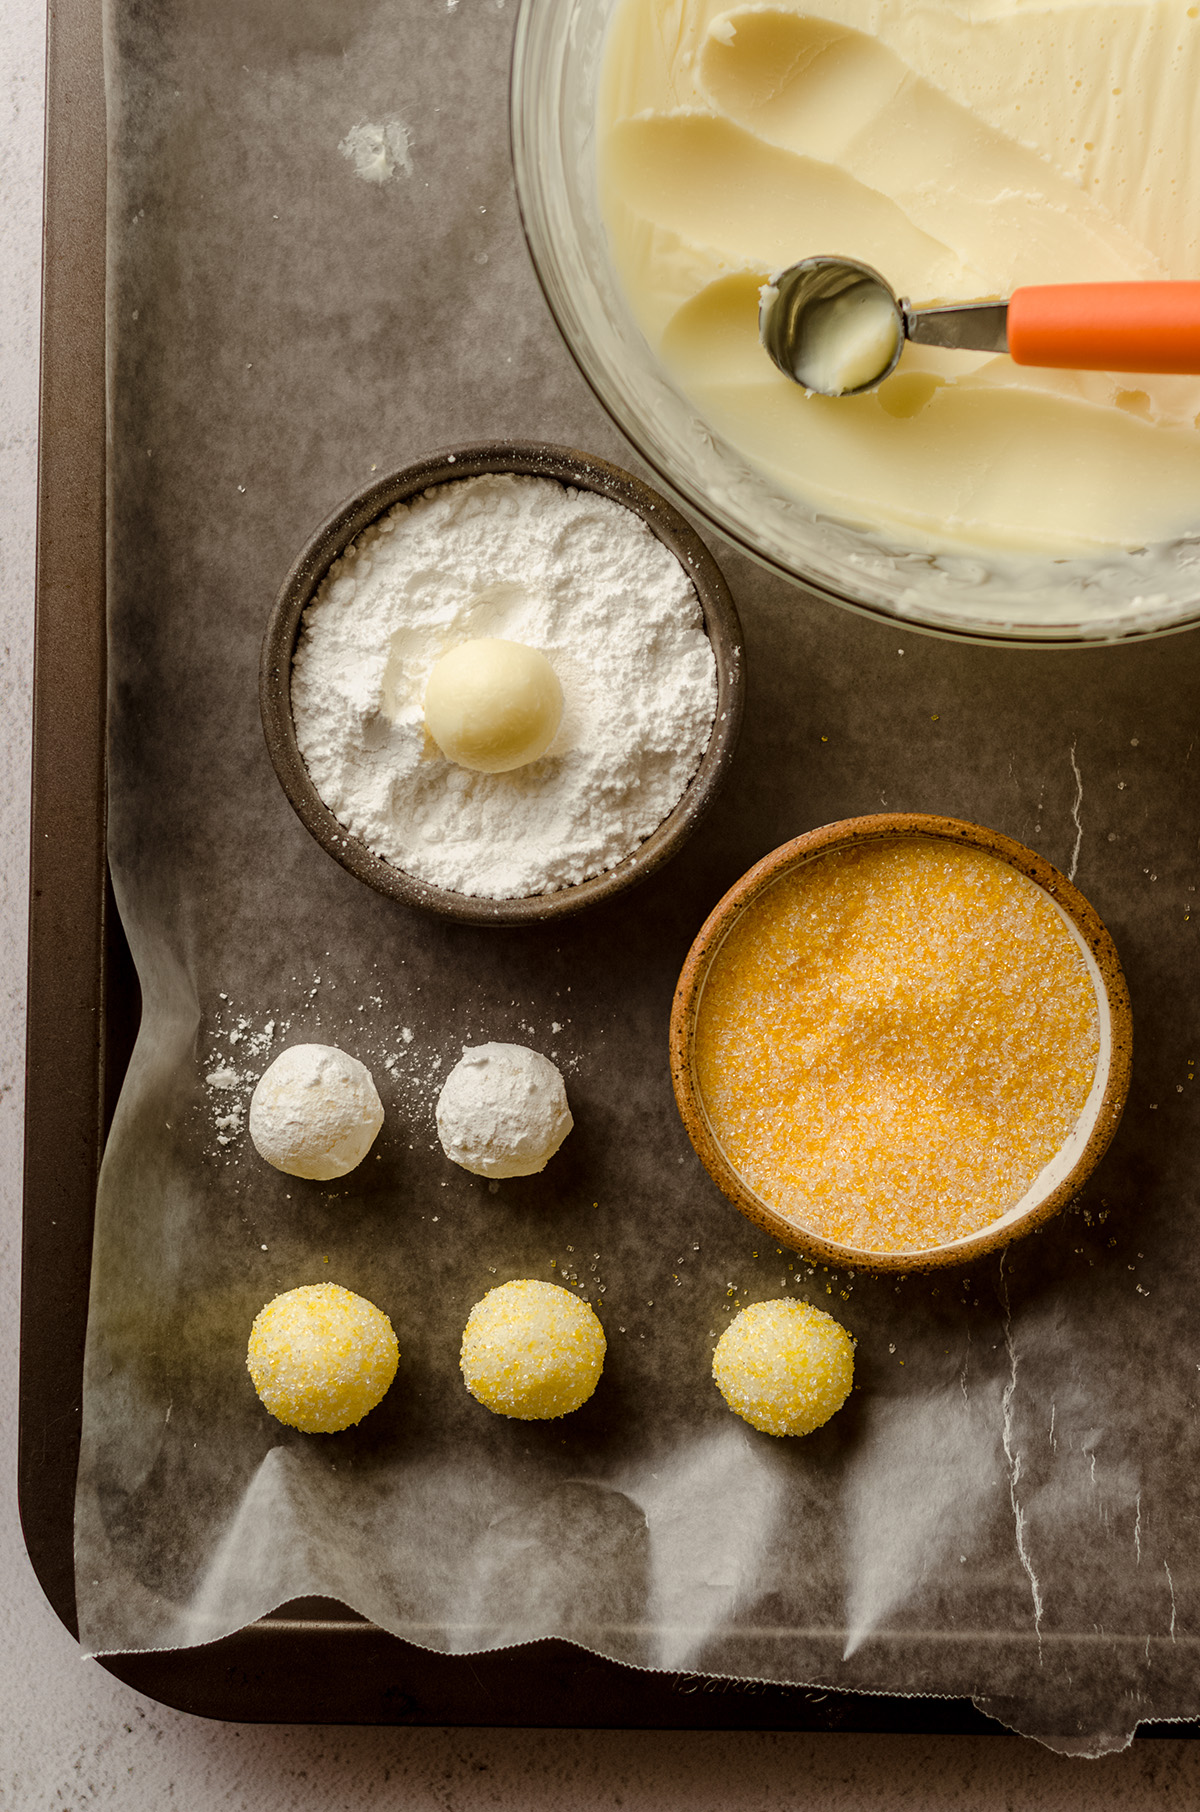 lemon truffles being rolled in powdered sugar